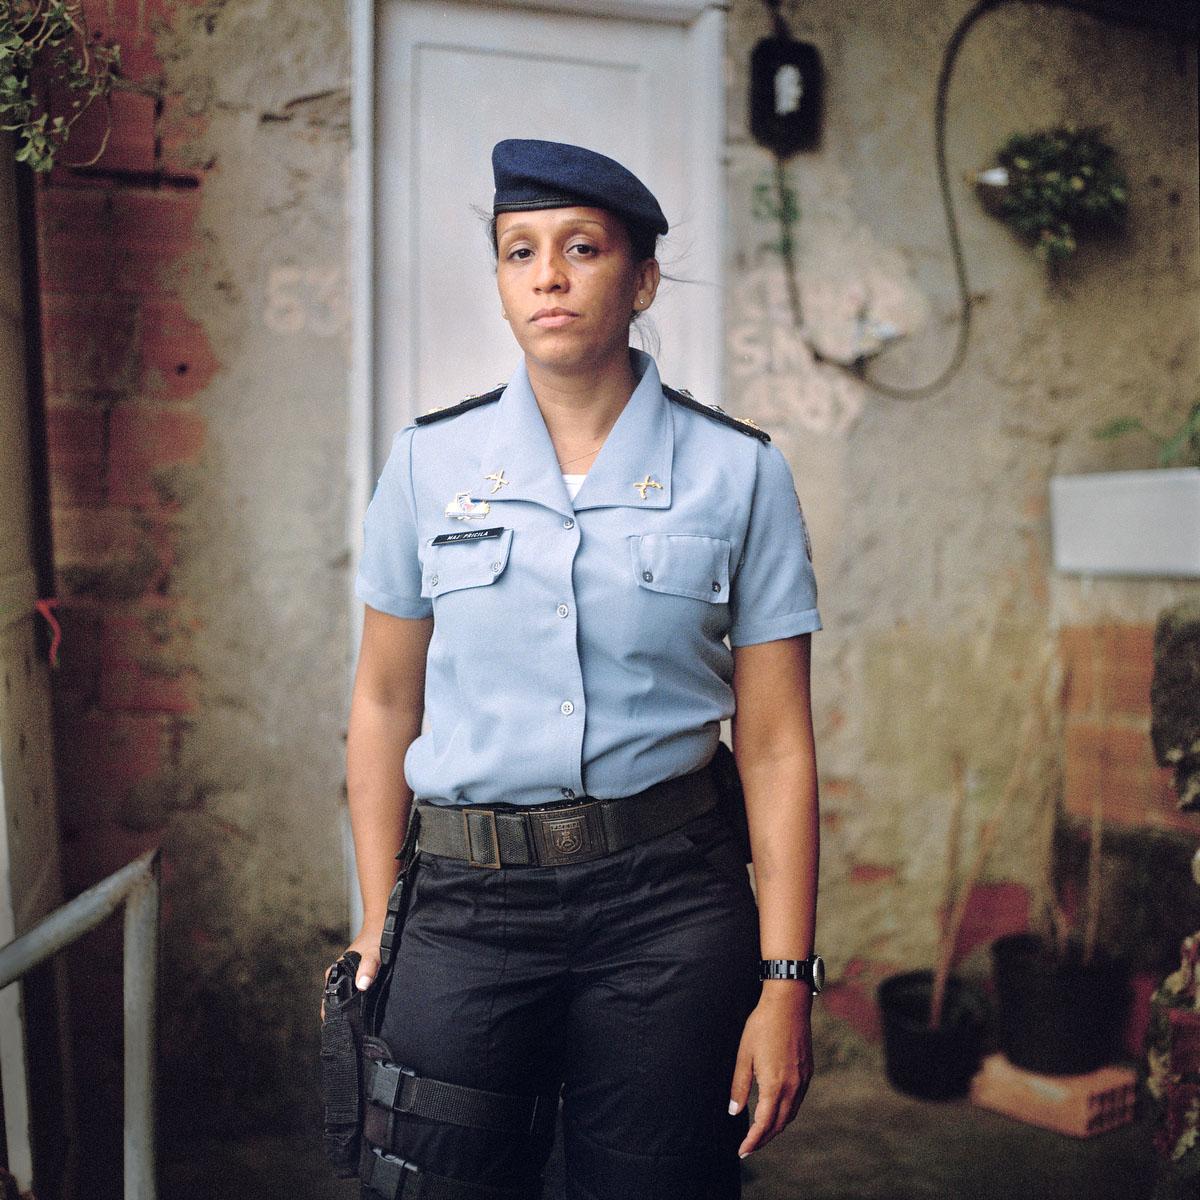 Major Priscila de Oliveira Azevedo, leads the Pacifying Police Unit in Rocinha, the largest single favela in Latin America, in Rio de Janeiro, Brazil.